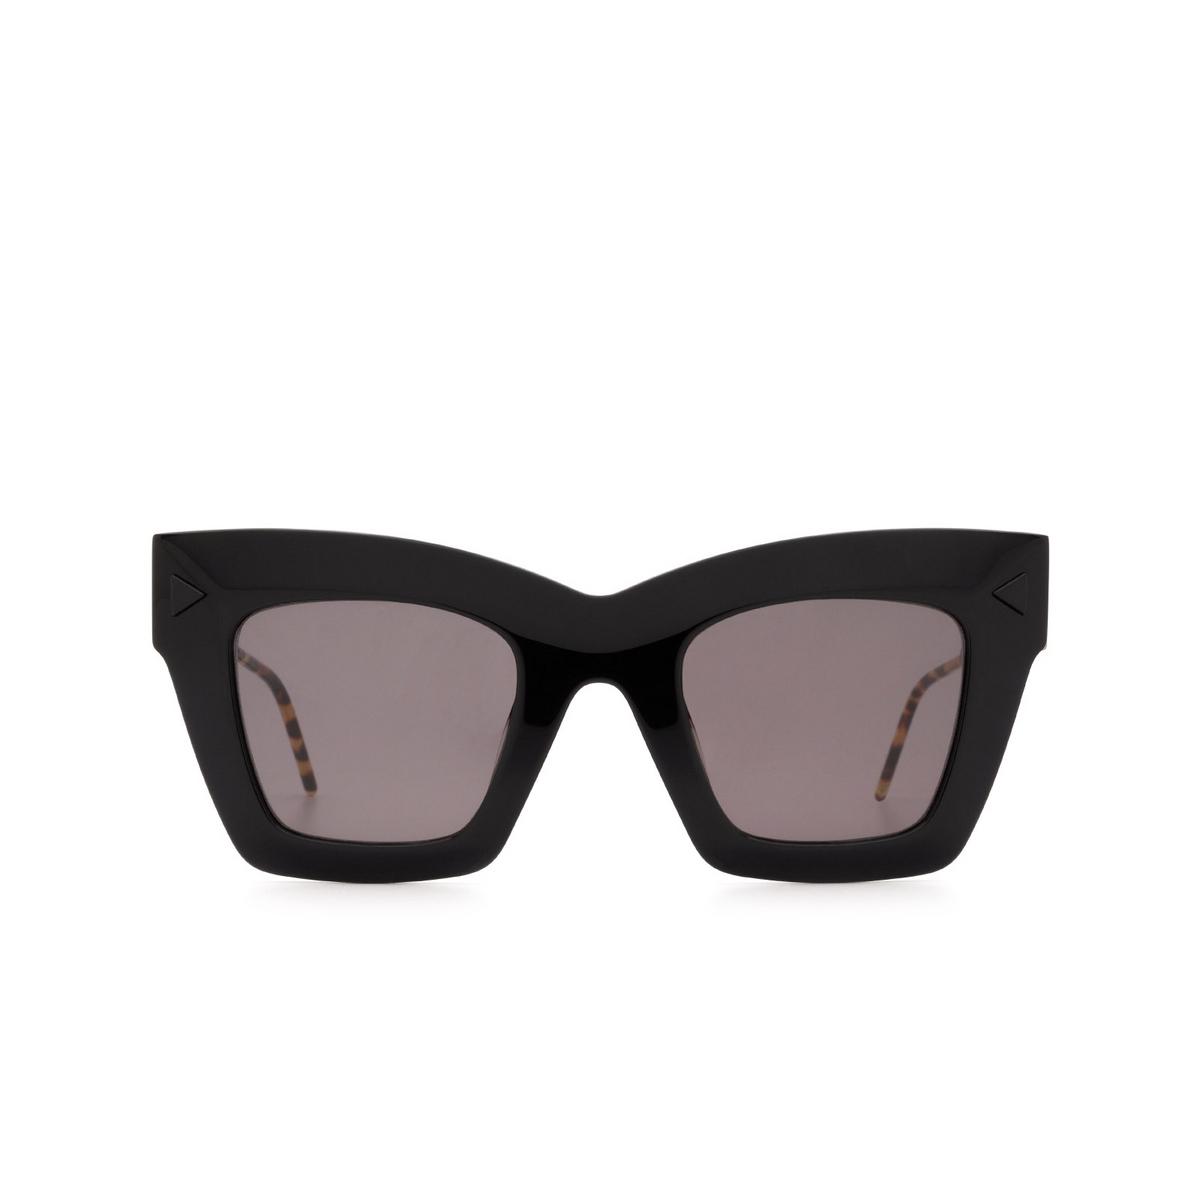 Soya® Square Sunglasses: Victoria color Shiny Black Blk-fs - front view.